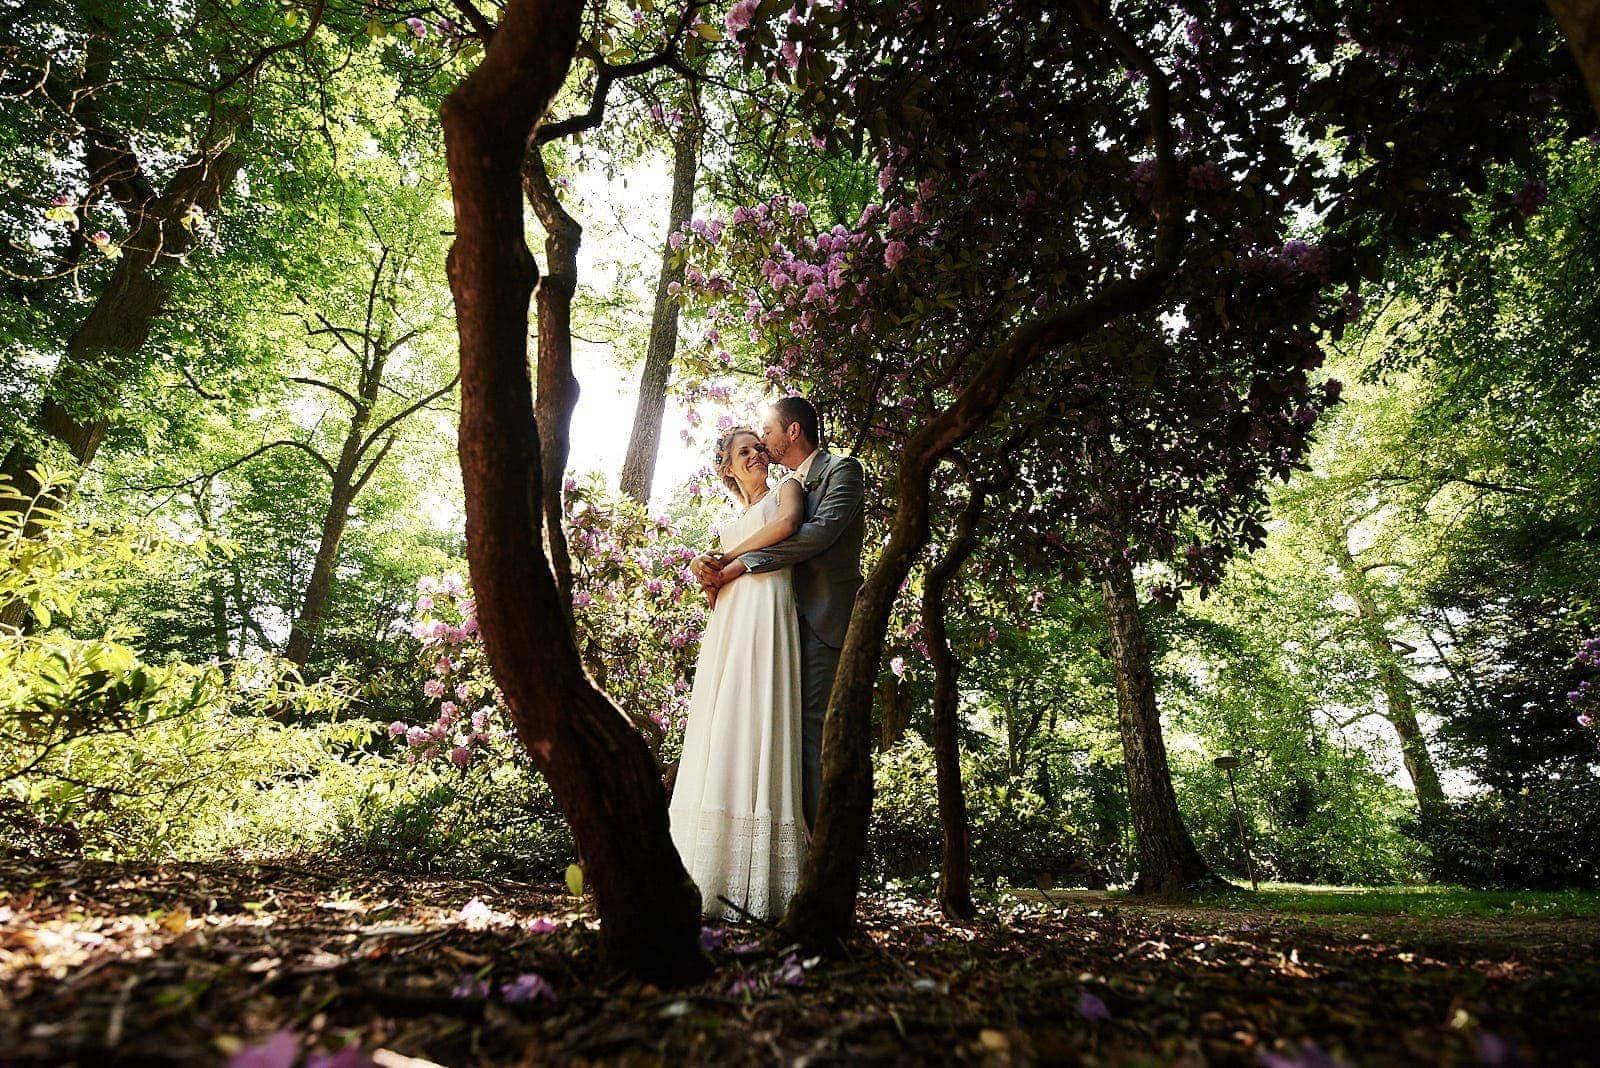 brautpaar unter märchenhaften bäumen fotografiert im nells park trier